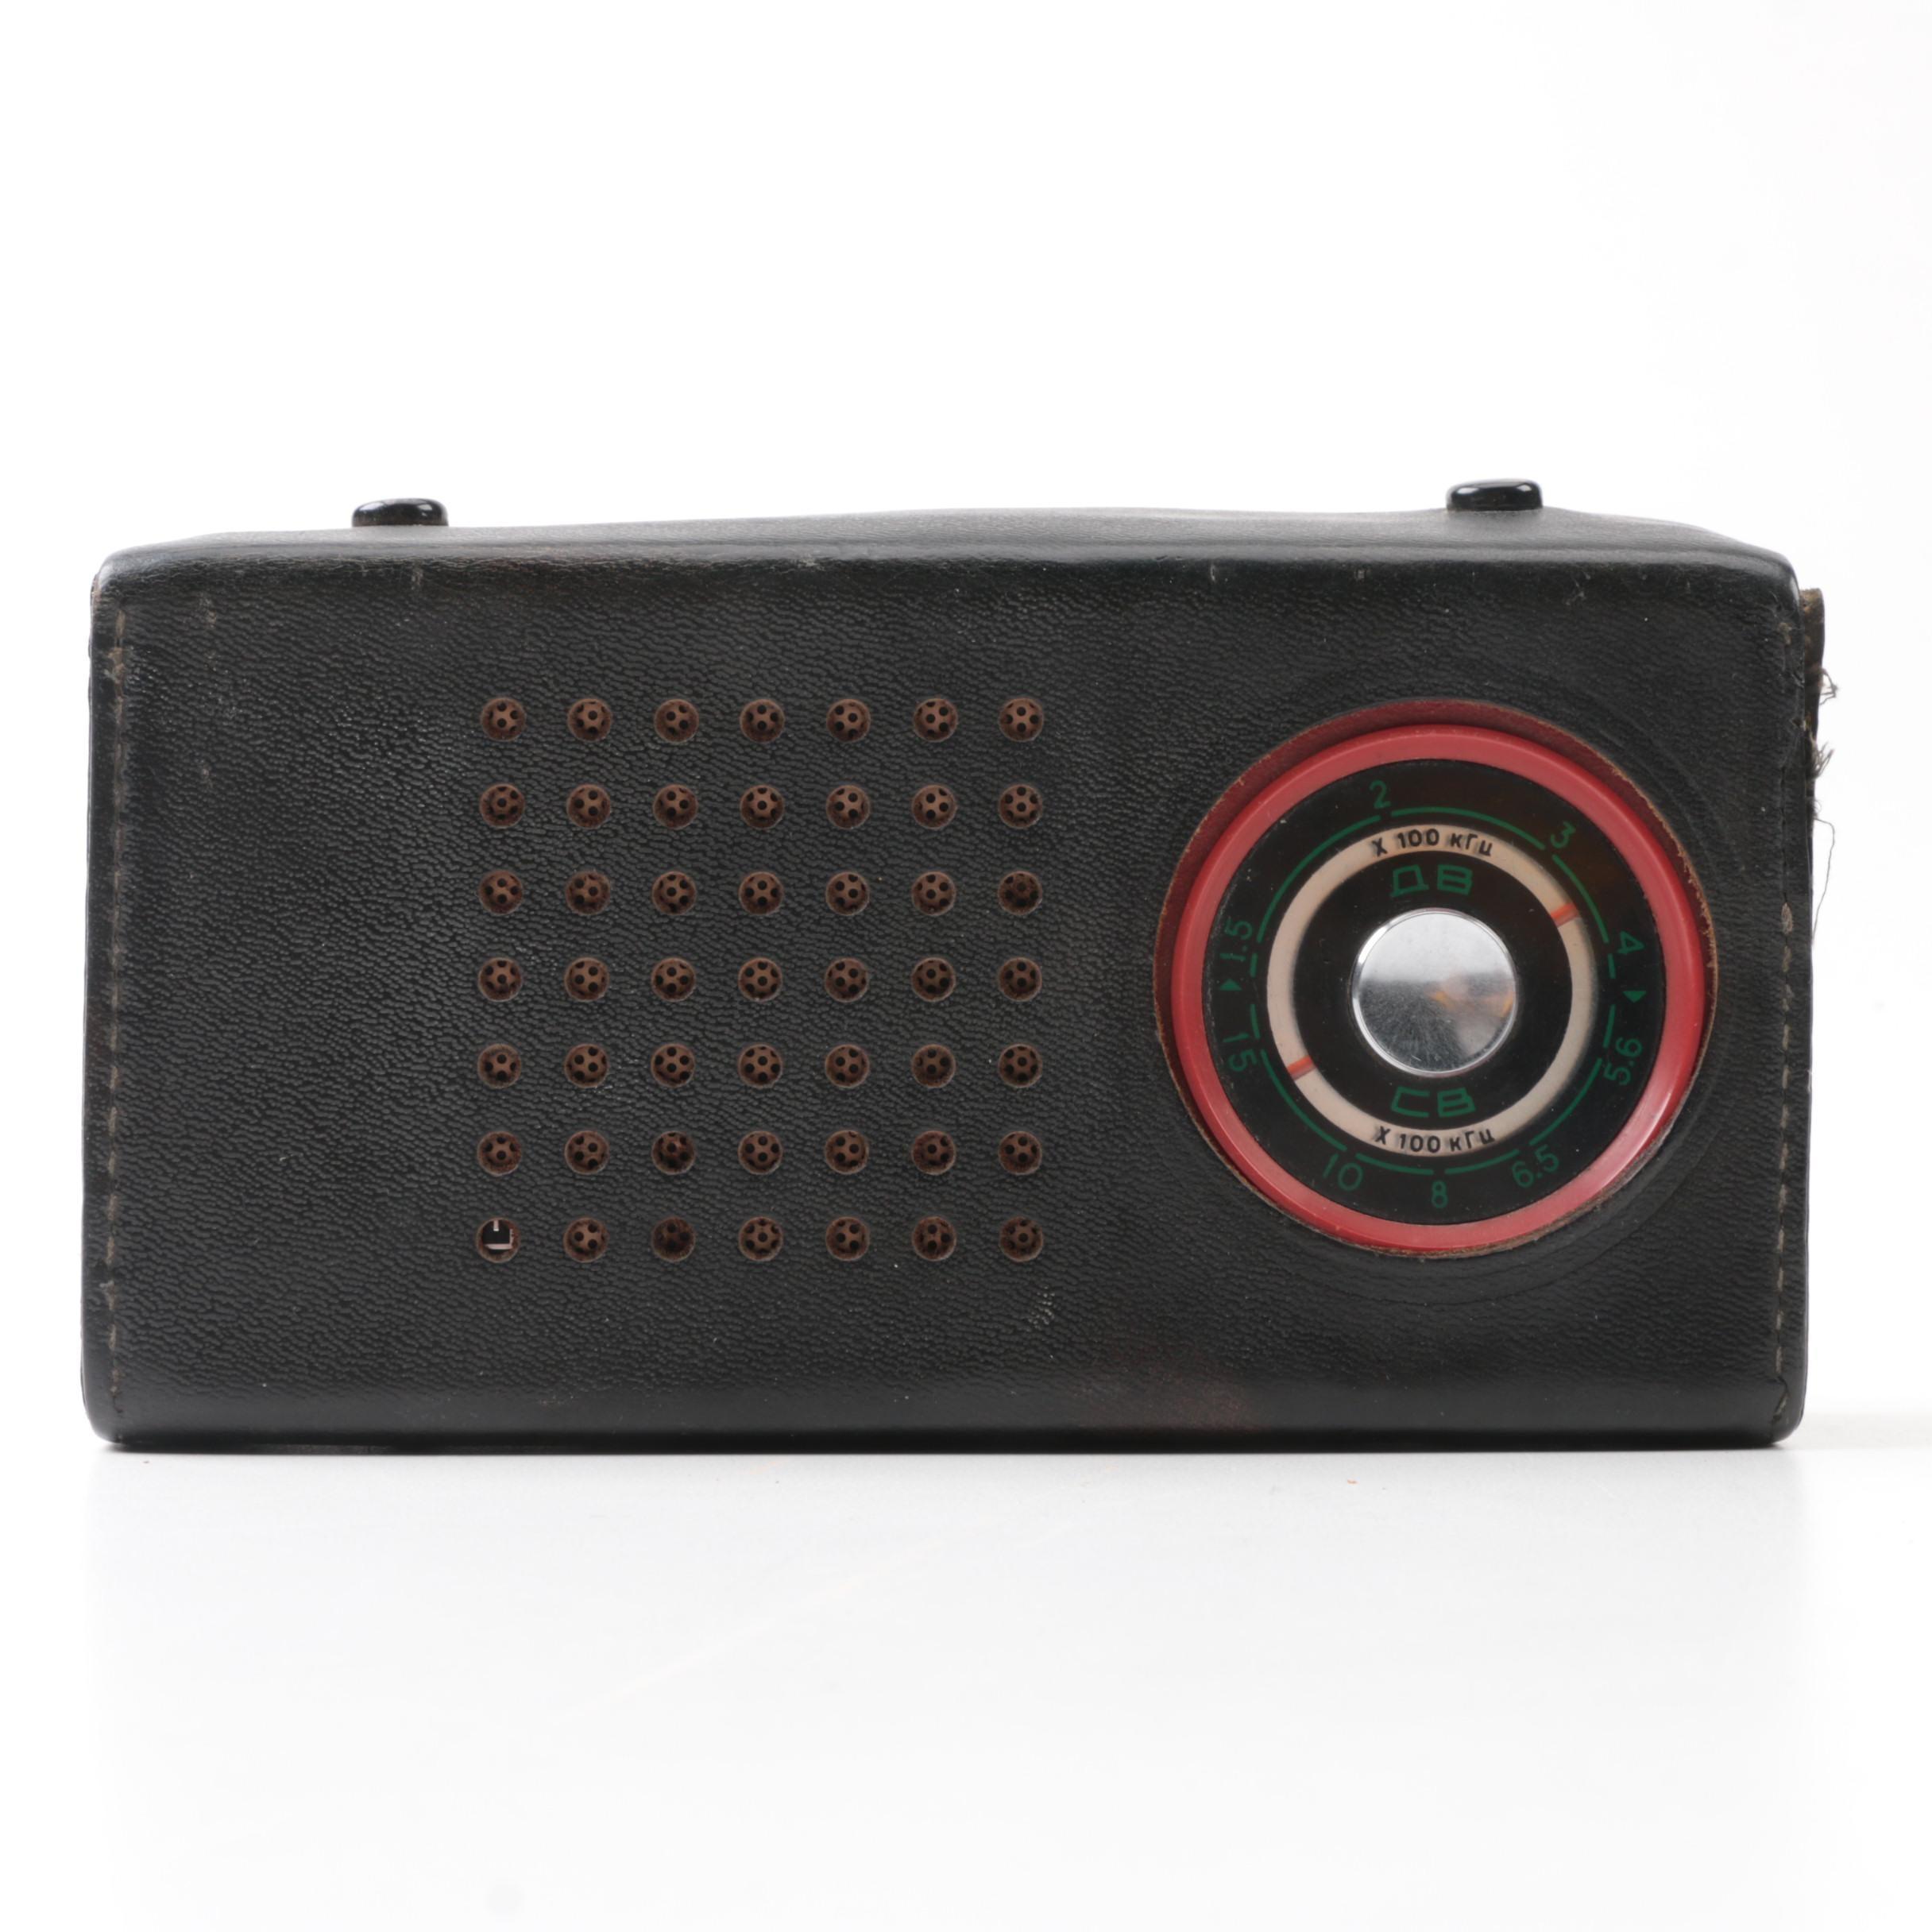 Vintage Soviet Selga 405 Portable Radio in Leather Case